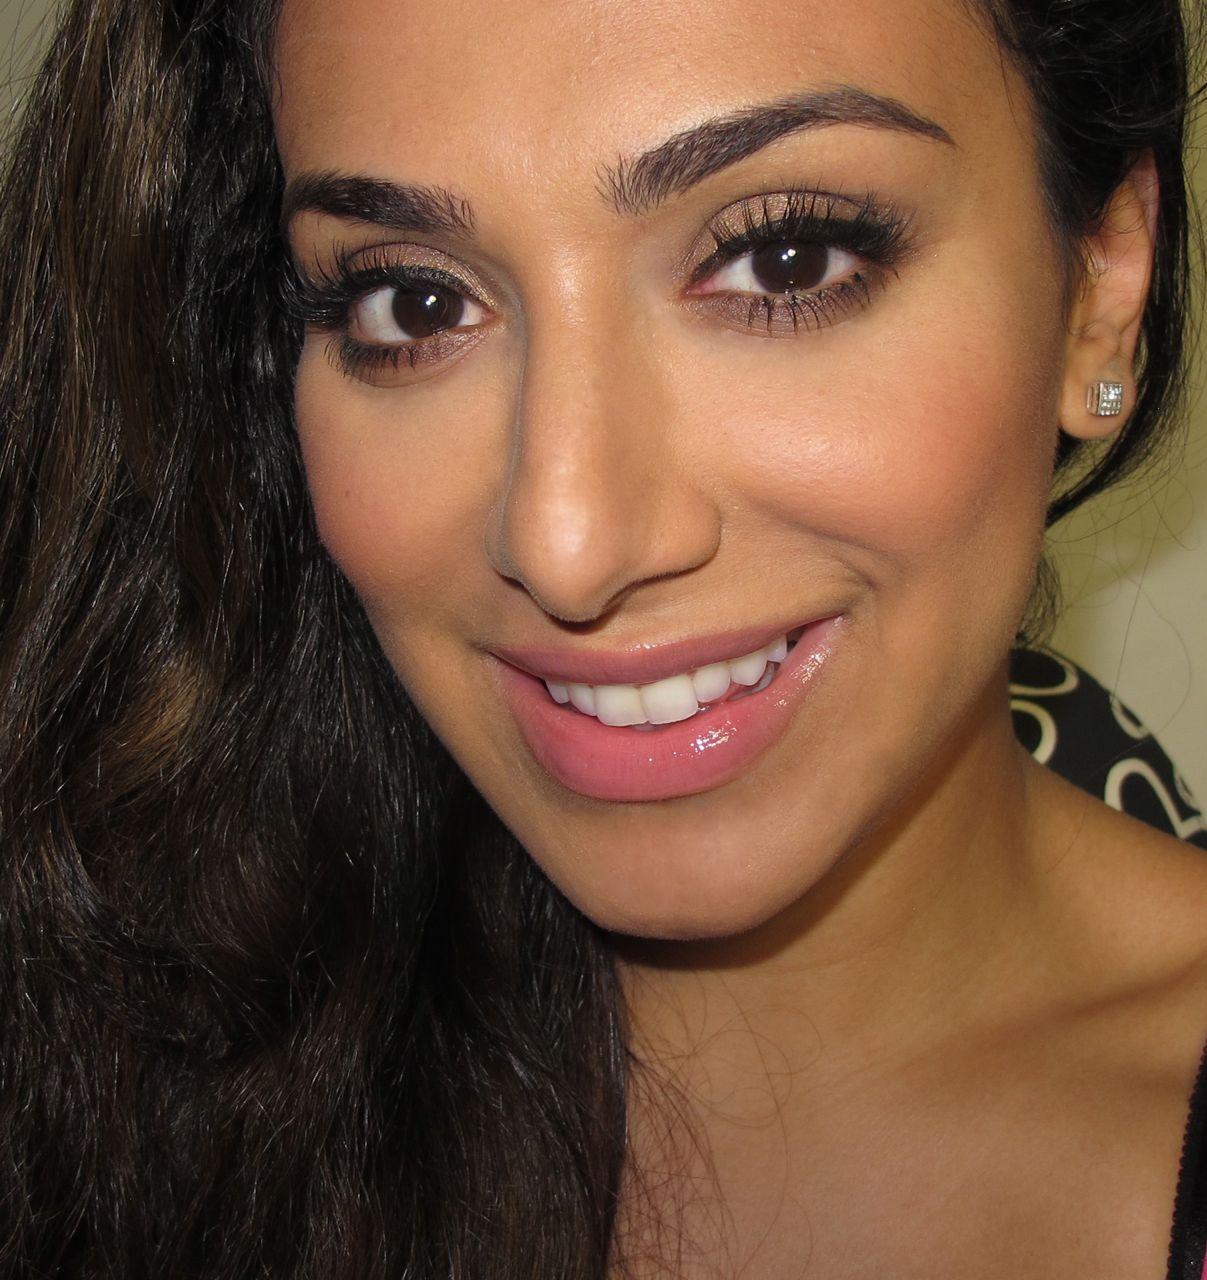 eyelash extensions styles | Huda Beauty Lash Extension Dollhouse ...